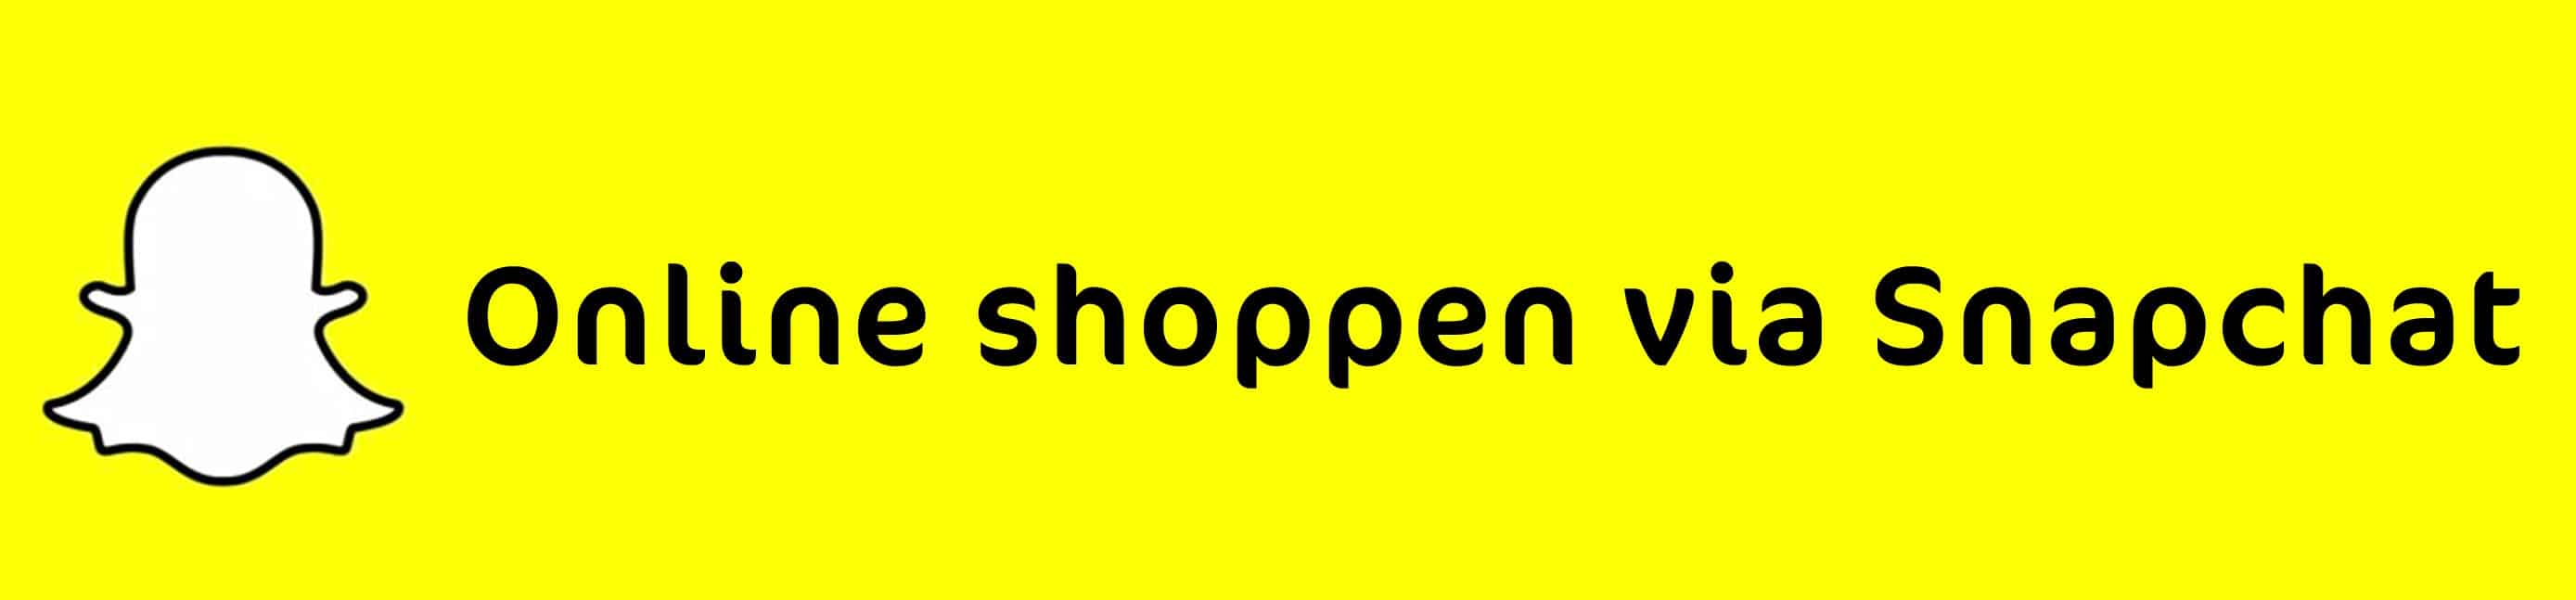 Shoppen snapchat